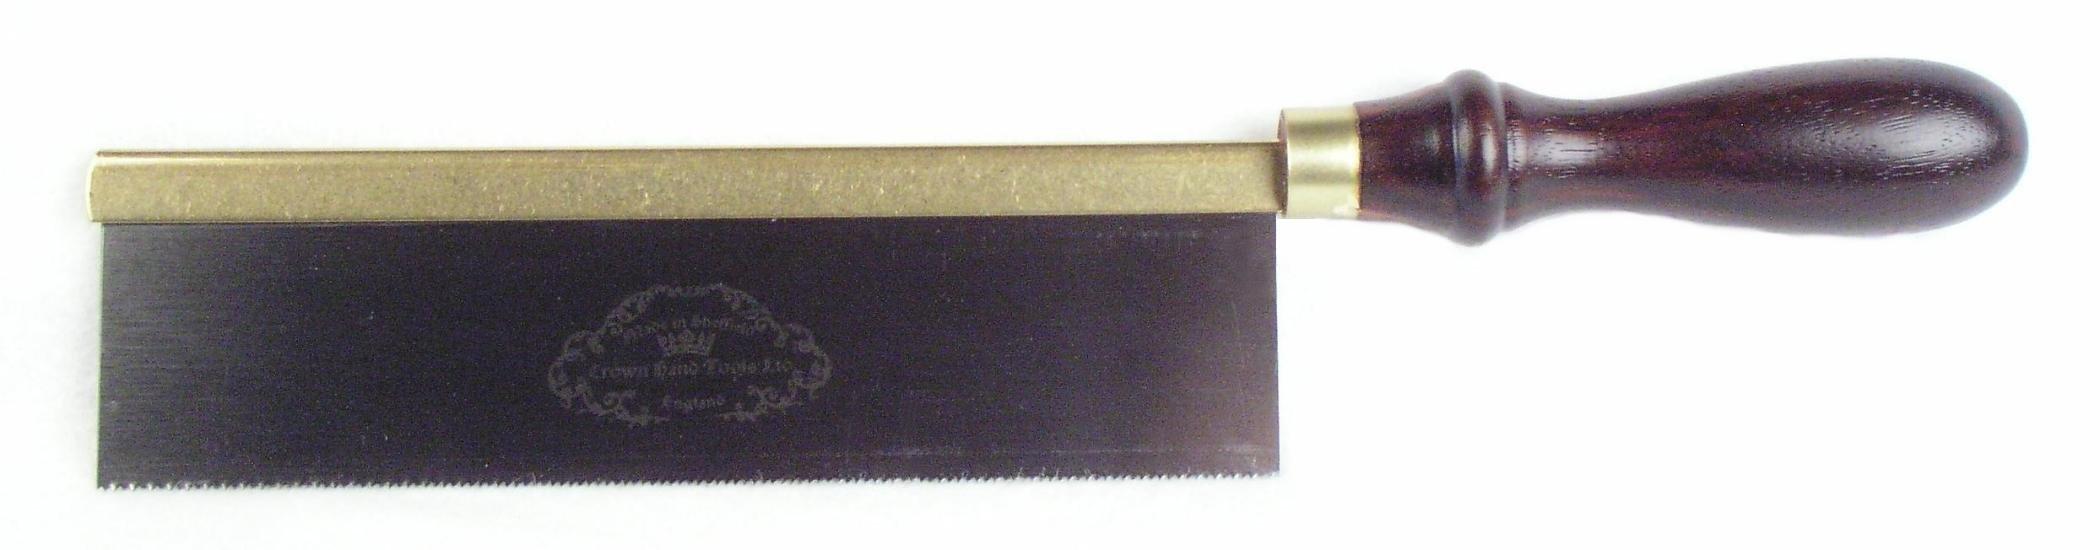 Crown FLINN2 8'' Pax Gents Dovetail Saw,Carbon Steel, Beech Handle